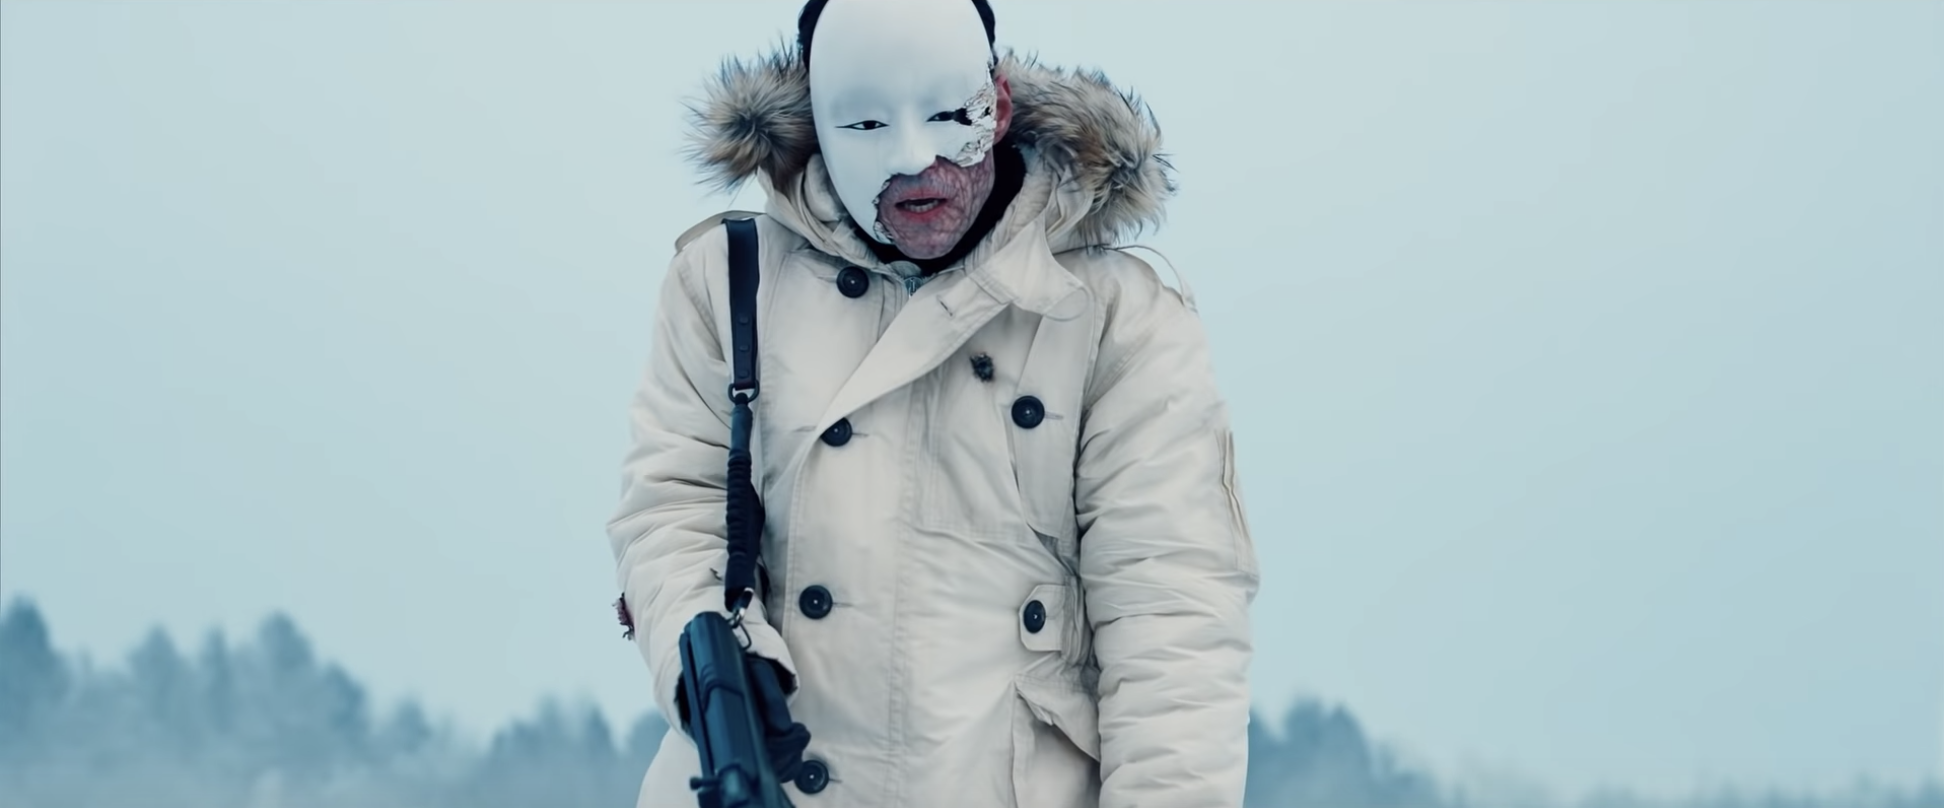 Rami Malek's masked villain No Time To Die